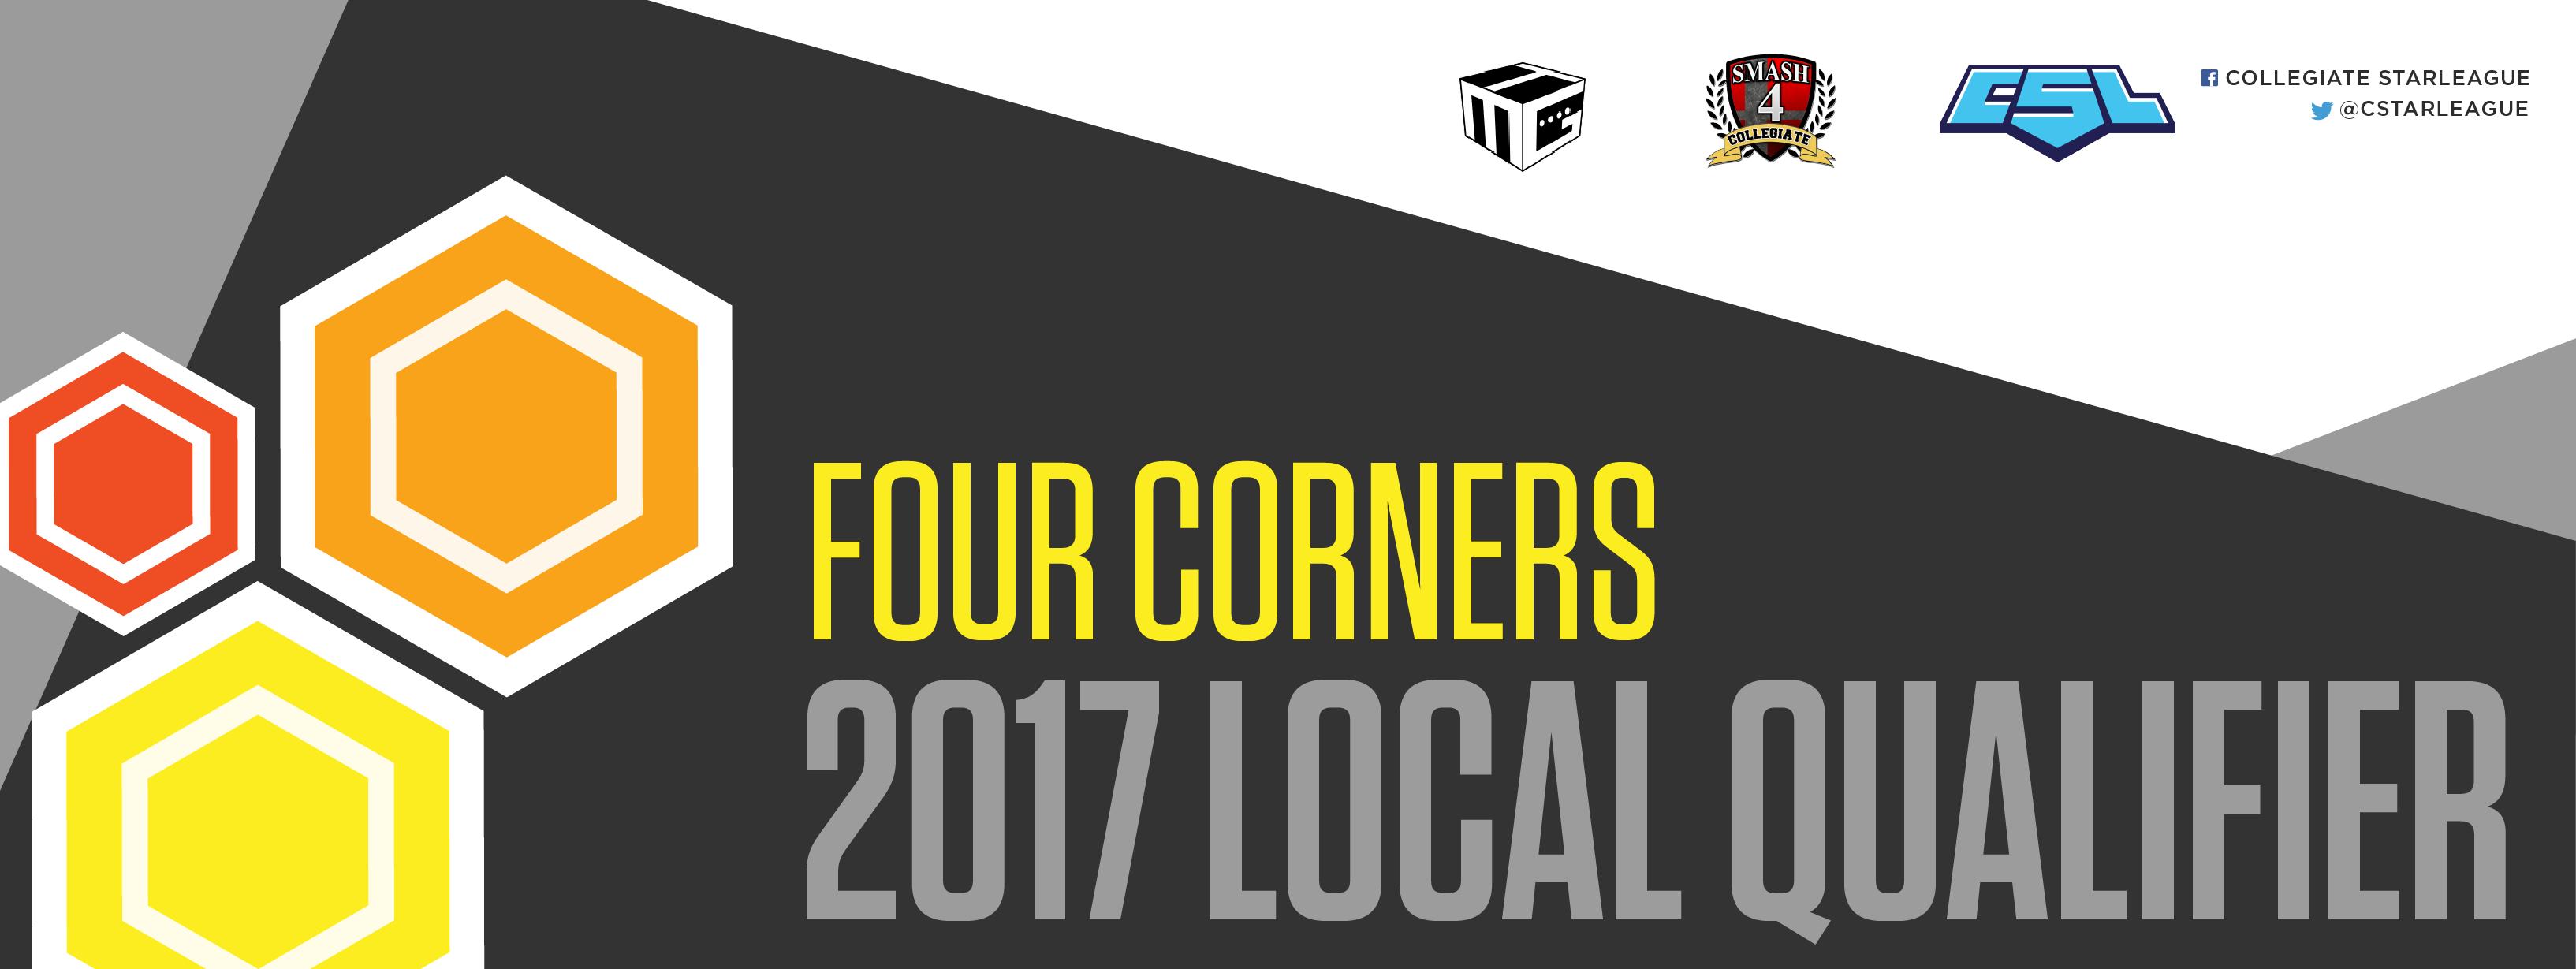 Four corners 01